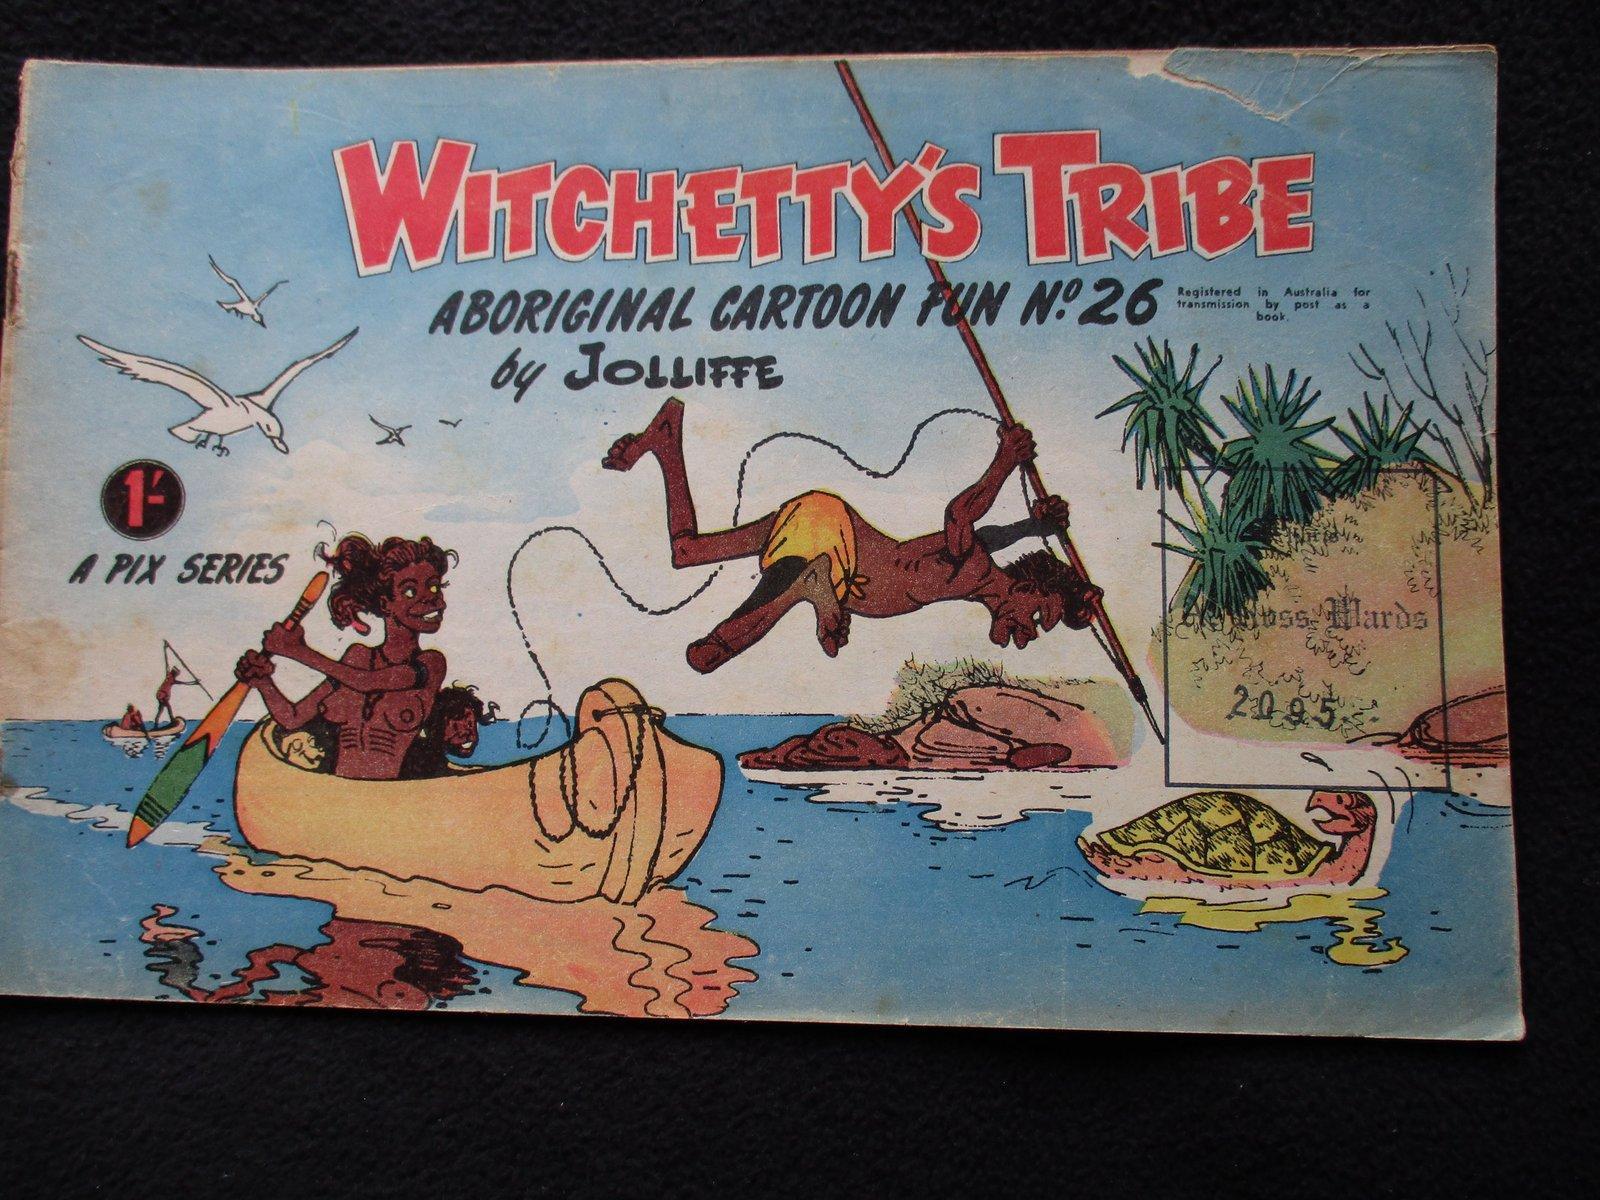 Witchettys Tribe Aboriginal Cartoon Fun No 26 A Pix Series